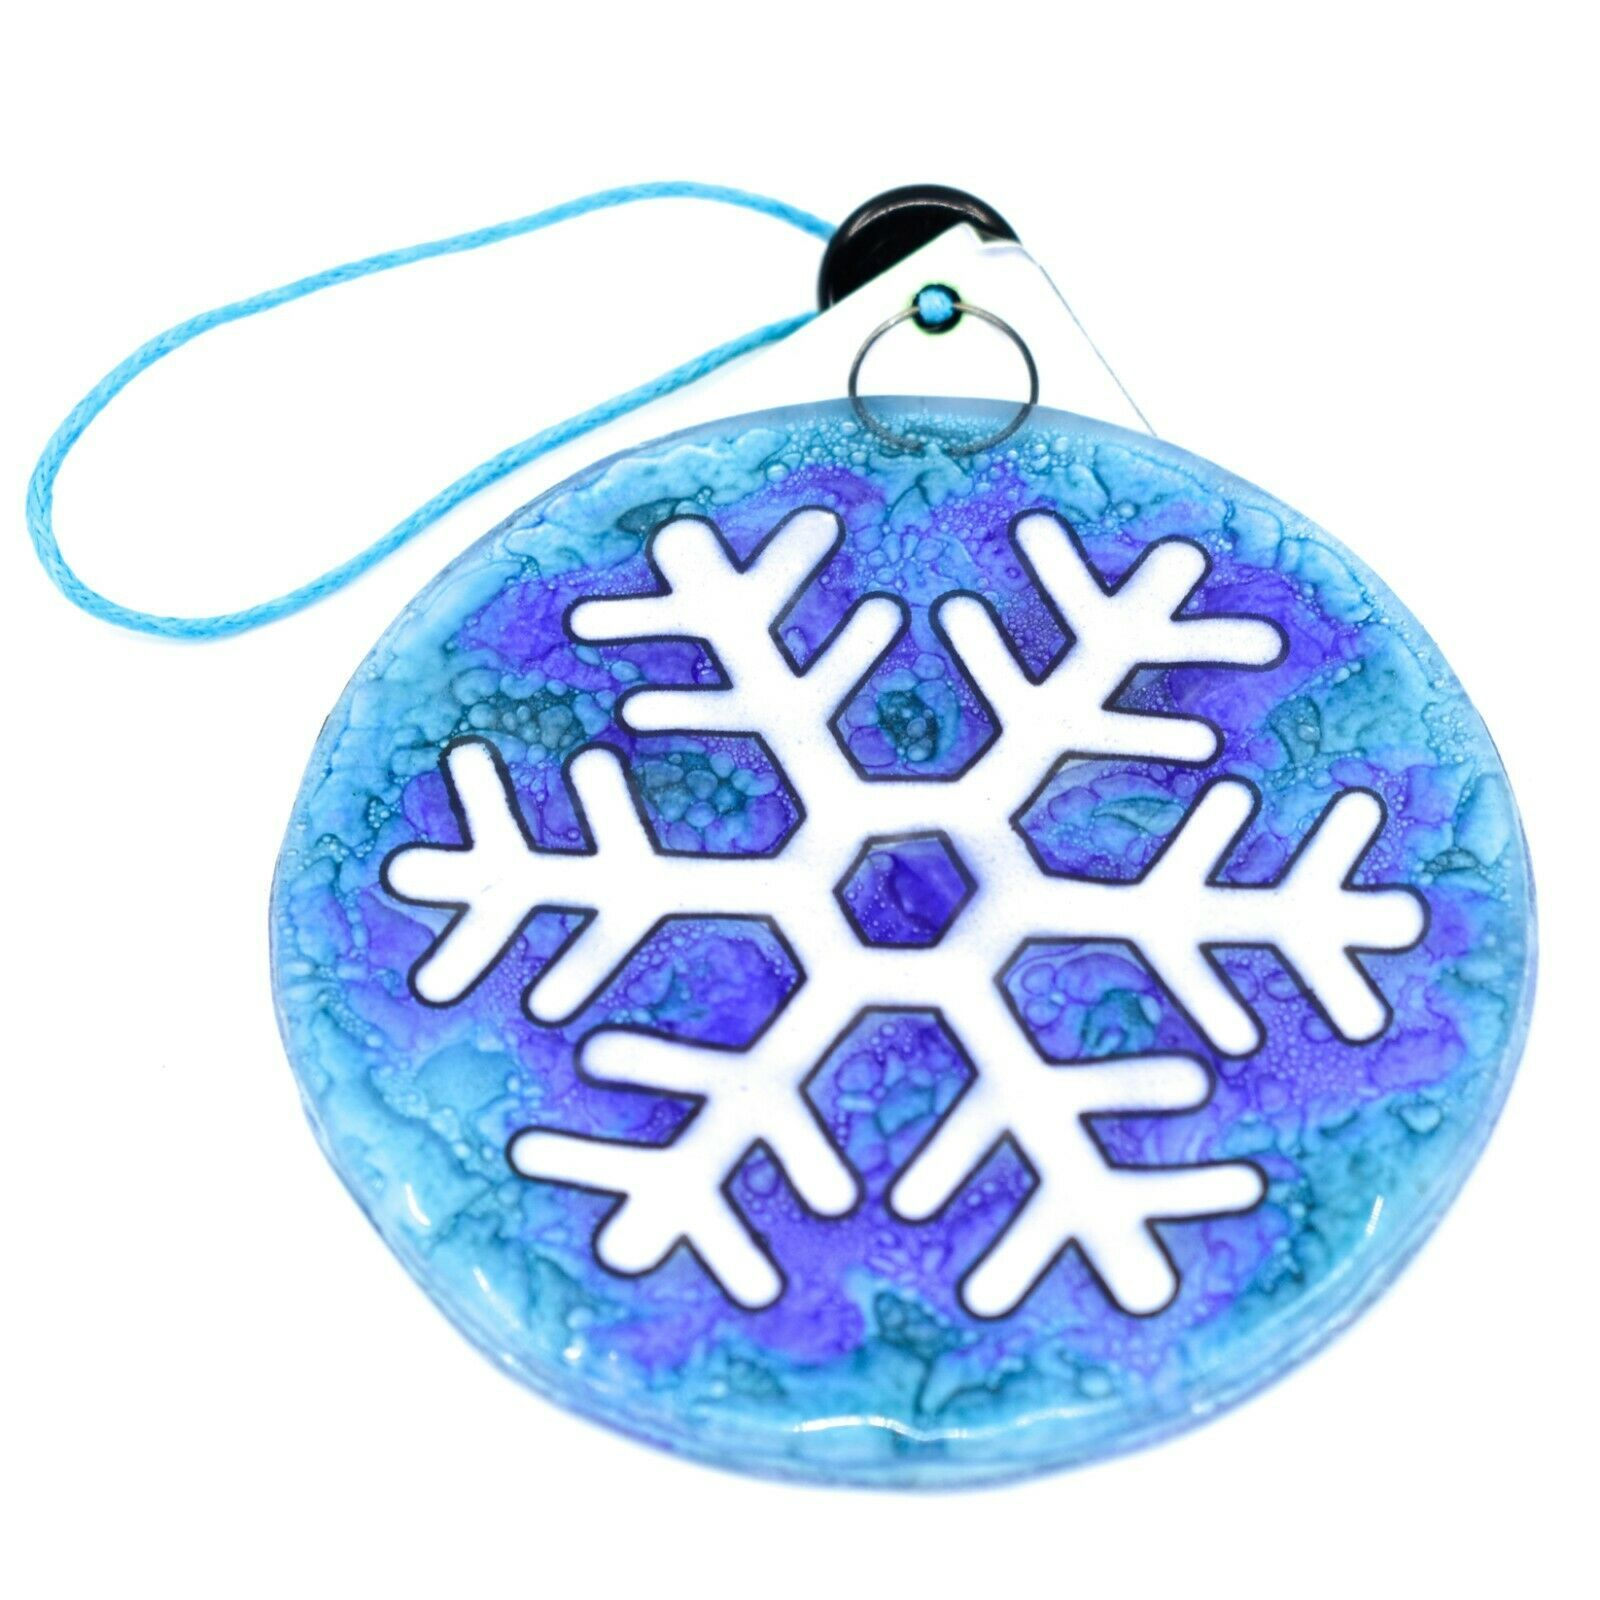 Fused Art Glass Winter Snowflake Ornament Handmade in Ecuador